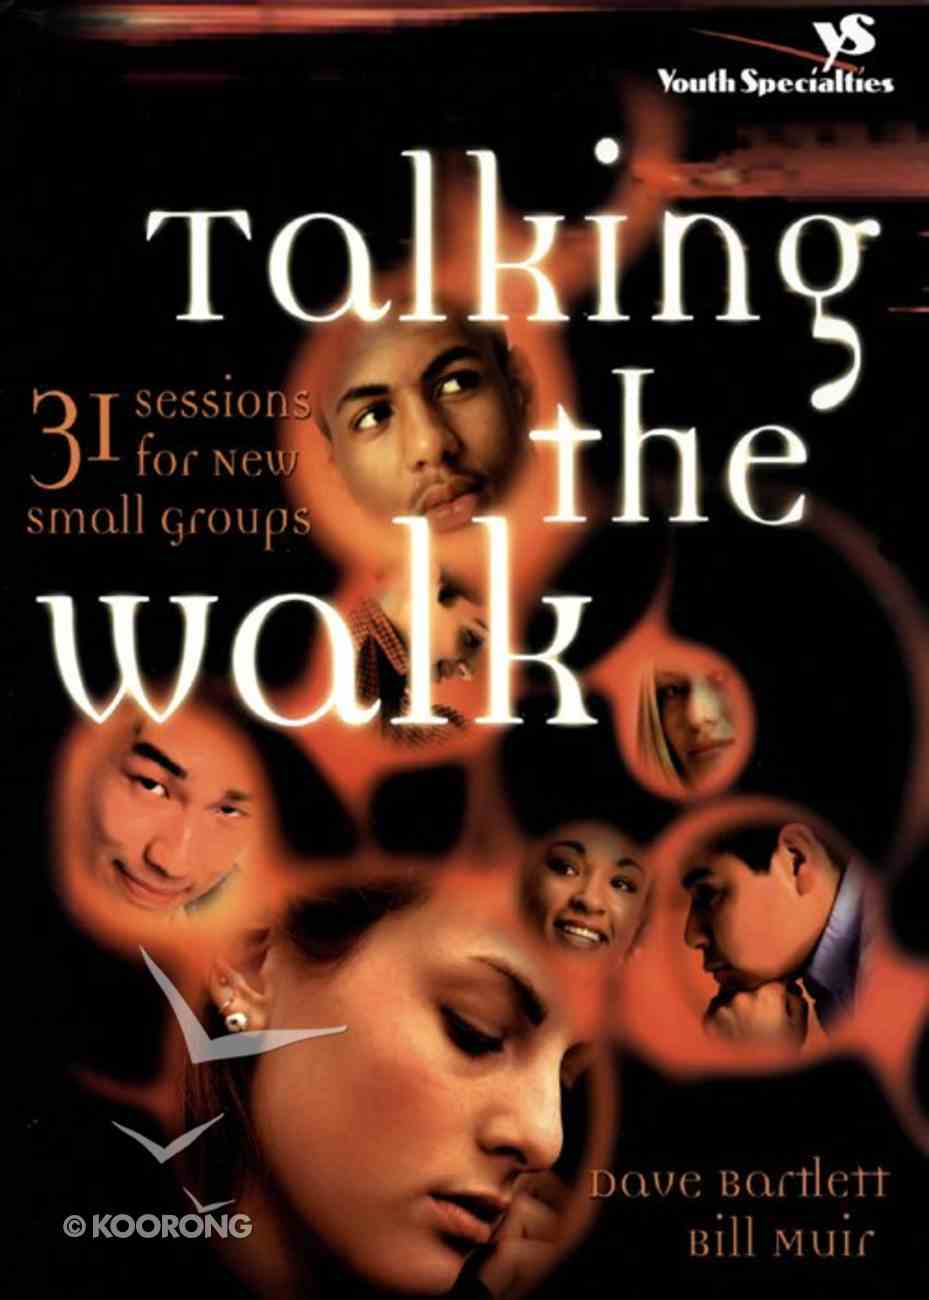 Talking the Walk eBook